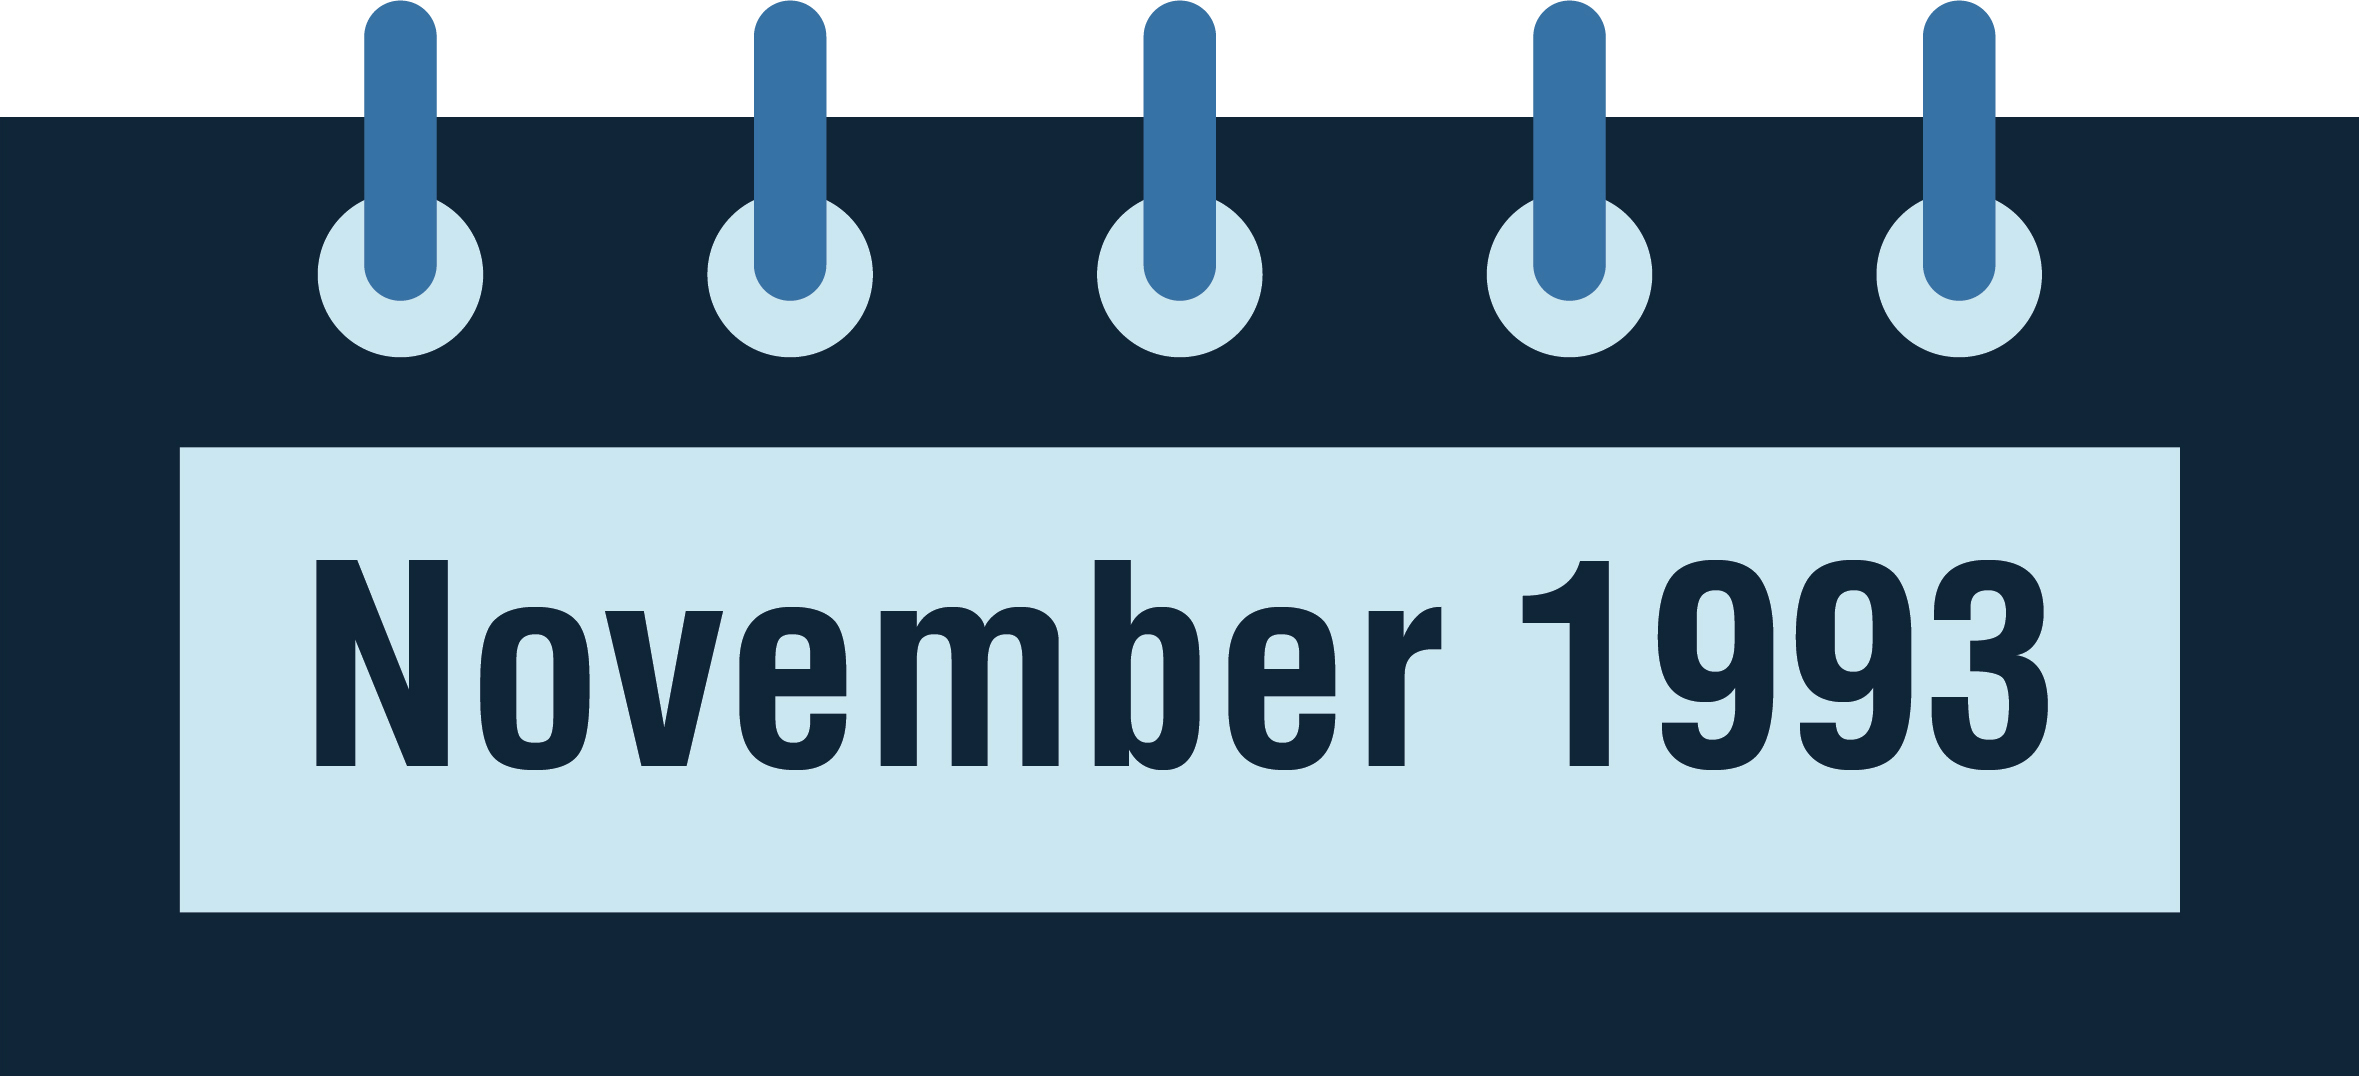 NeuroCheck History - November 1993 (Image © NeuroCheck)